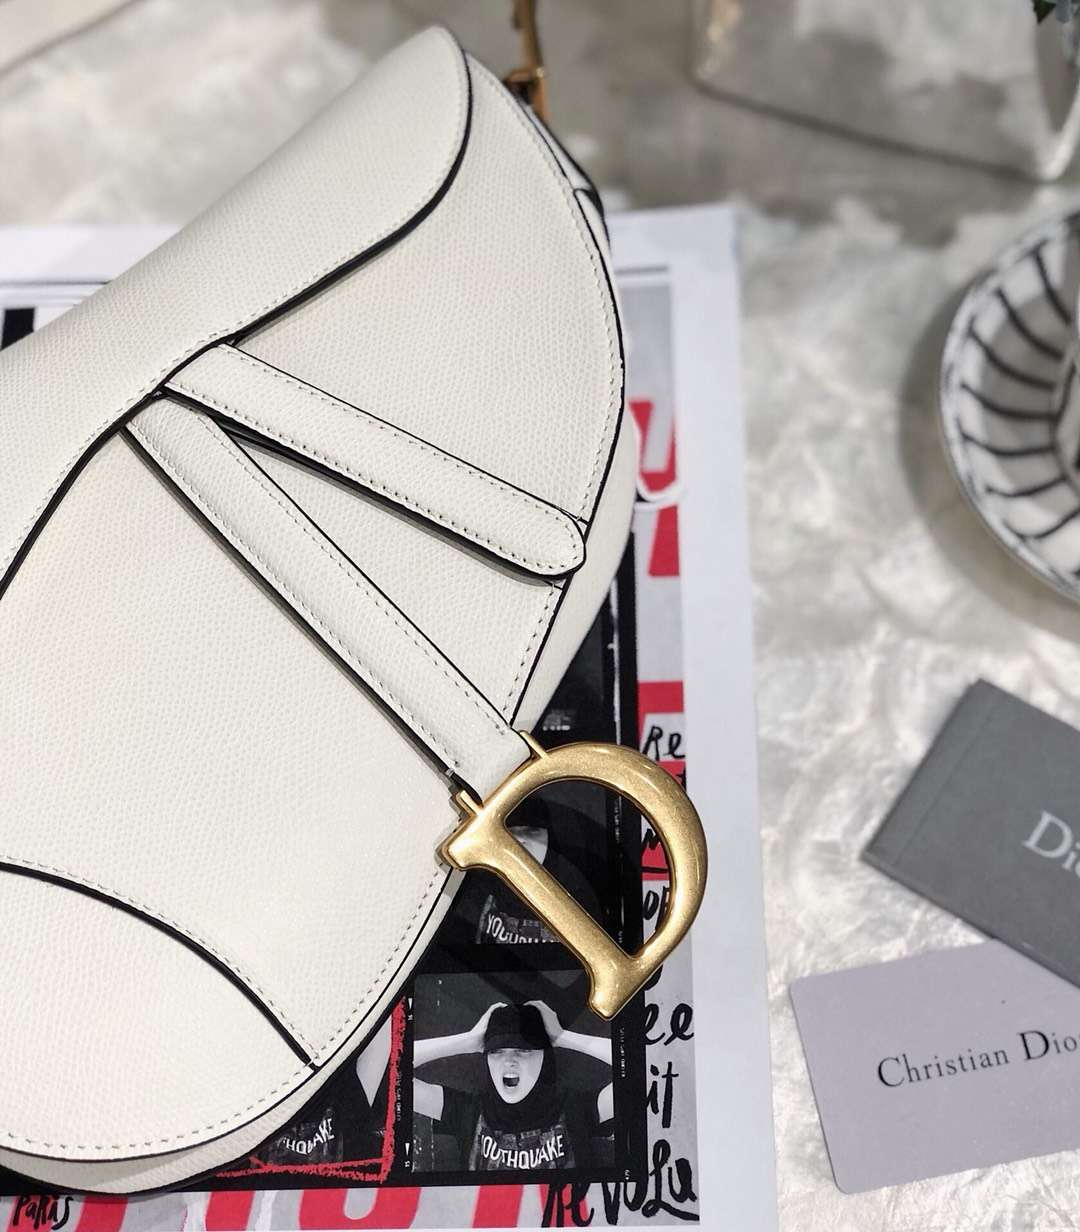 Dior包包价格 迪奥新款掌纹牛皮Saddle马鞍包单肩包大号26CM 白色